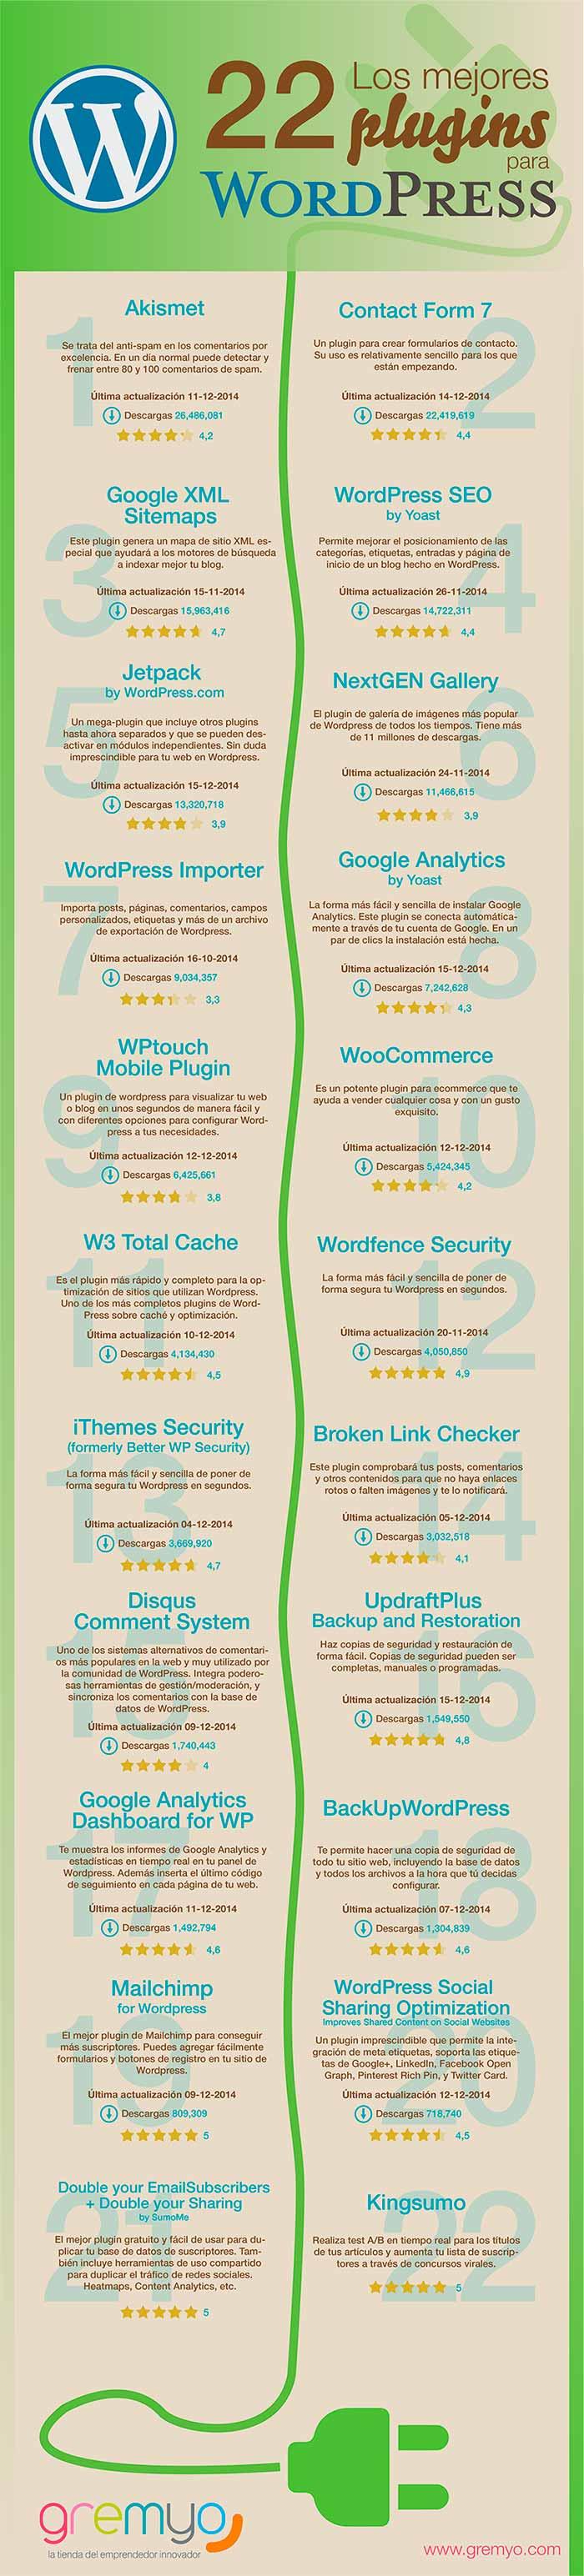 Infografia sobre los 22 mejores plugins para WordPress